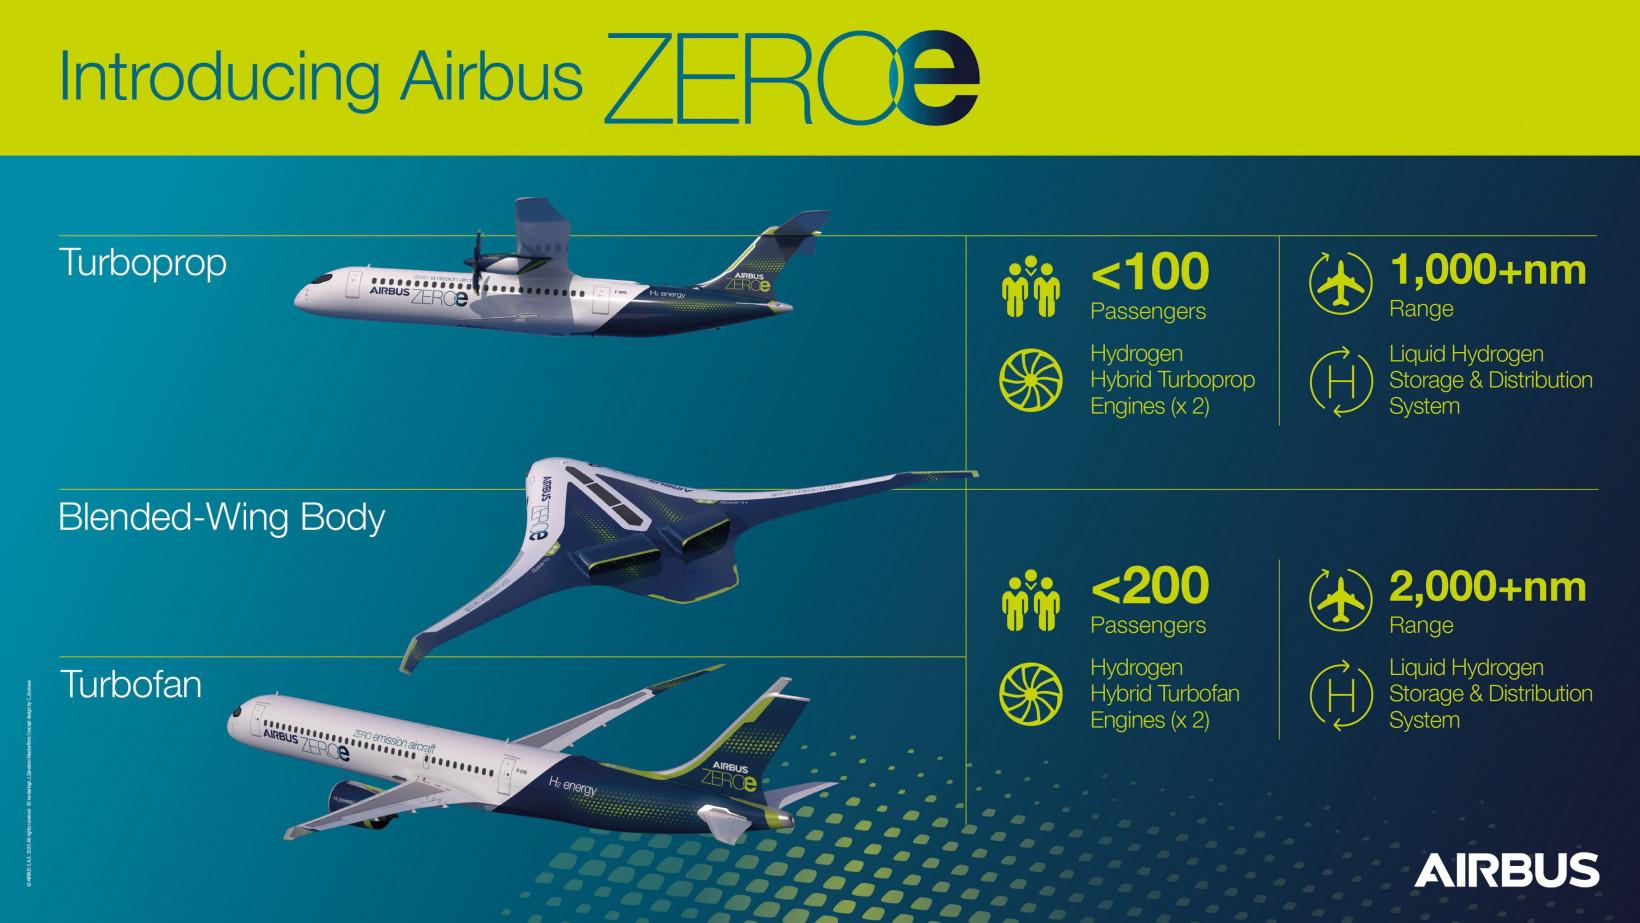 ev, plane, airbus, car, flight, future, travel